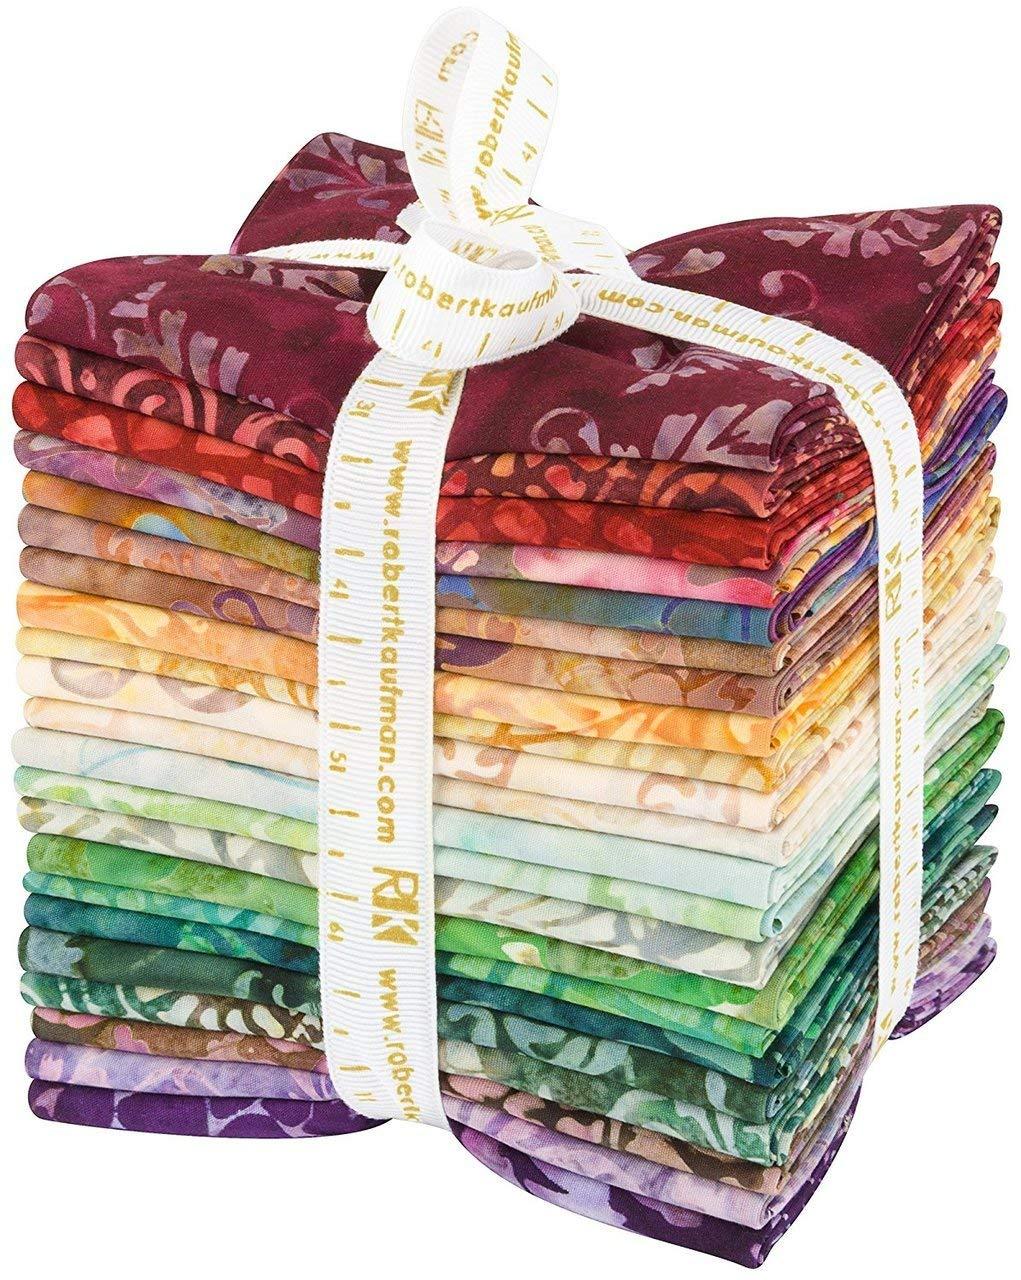 Robert Kaufman Fabrics マッケナライアンベラヴィータ22脂肪クオーター体F q-1243から1222 B07623BXTX